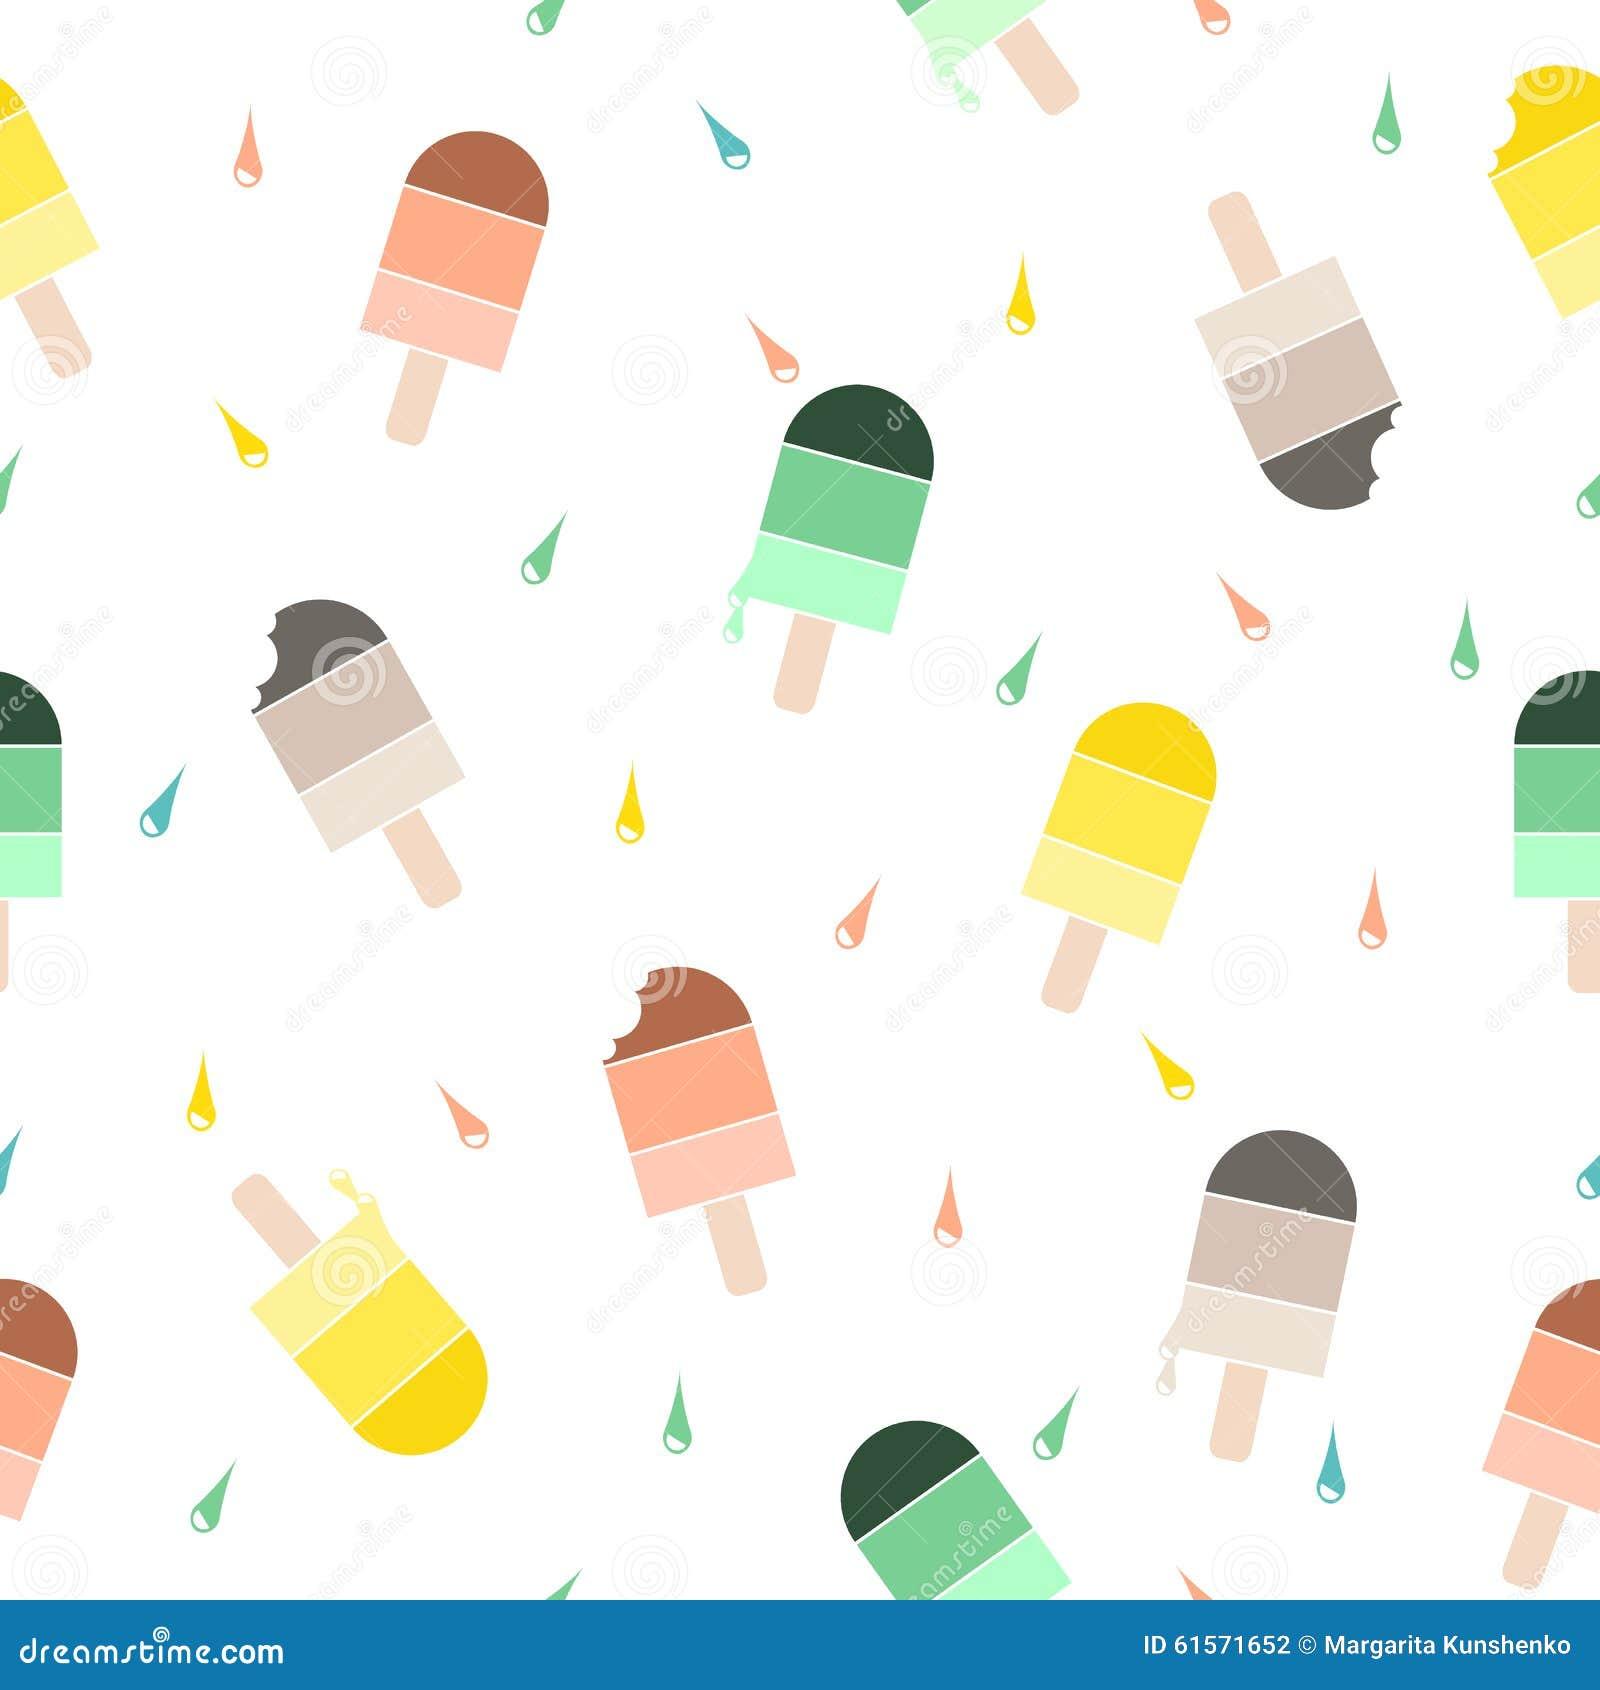 Cute Colorful Ice Cream Seamless Pattern Background: Ice Cream Pattern Background. Stock Vector